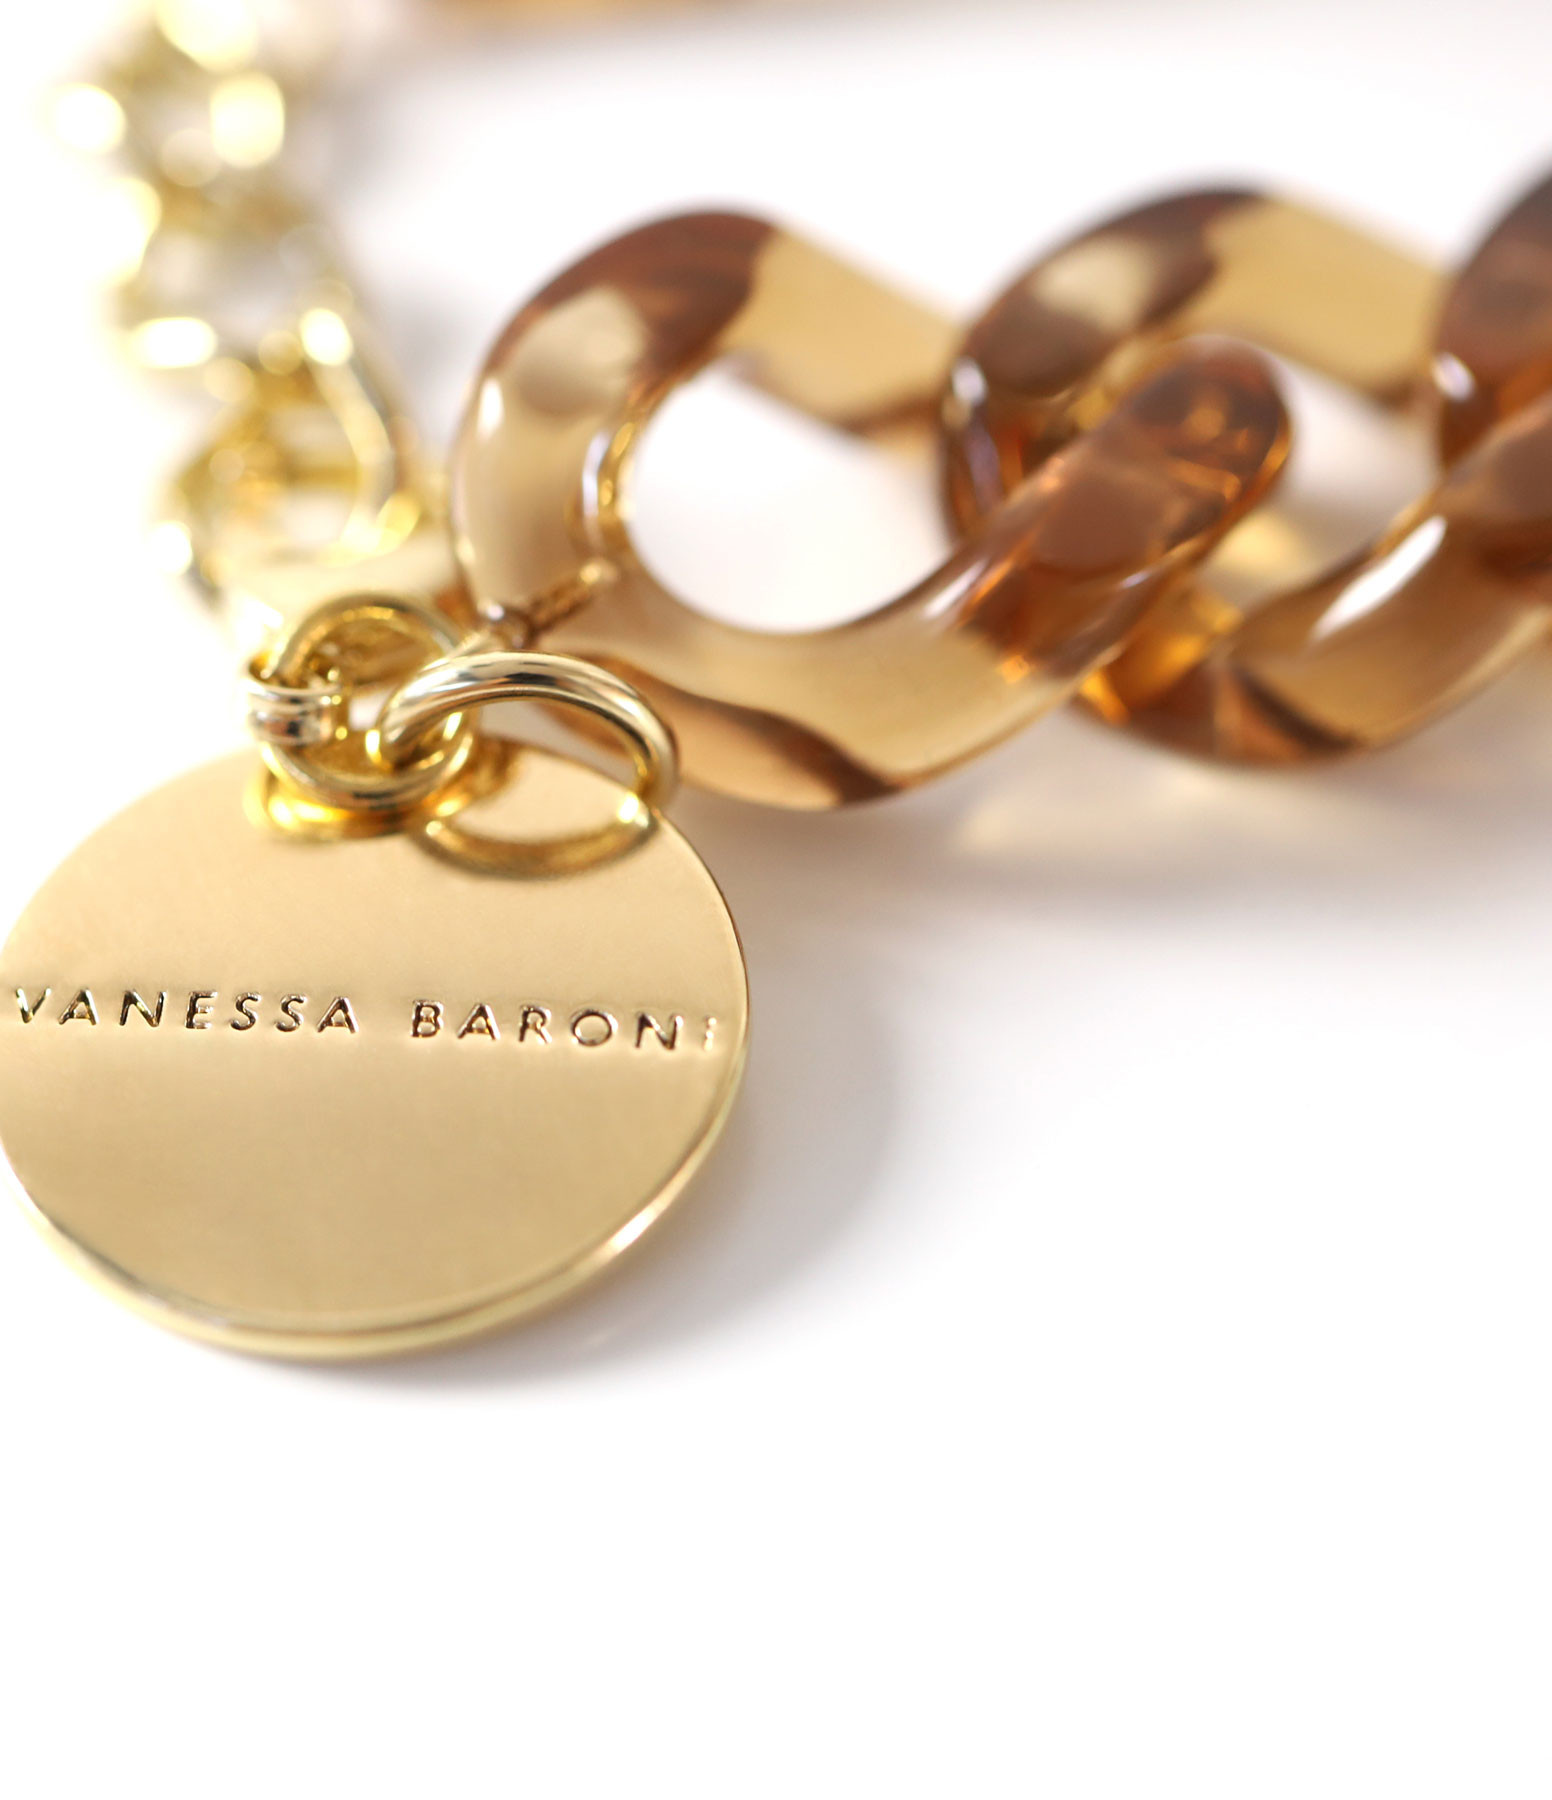 VANESSA BARONI - Bracelet Flat Clear Brown